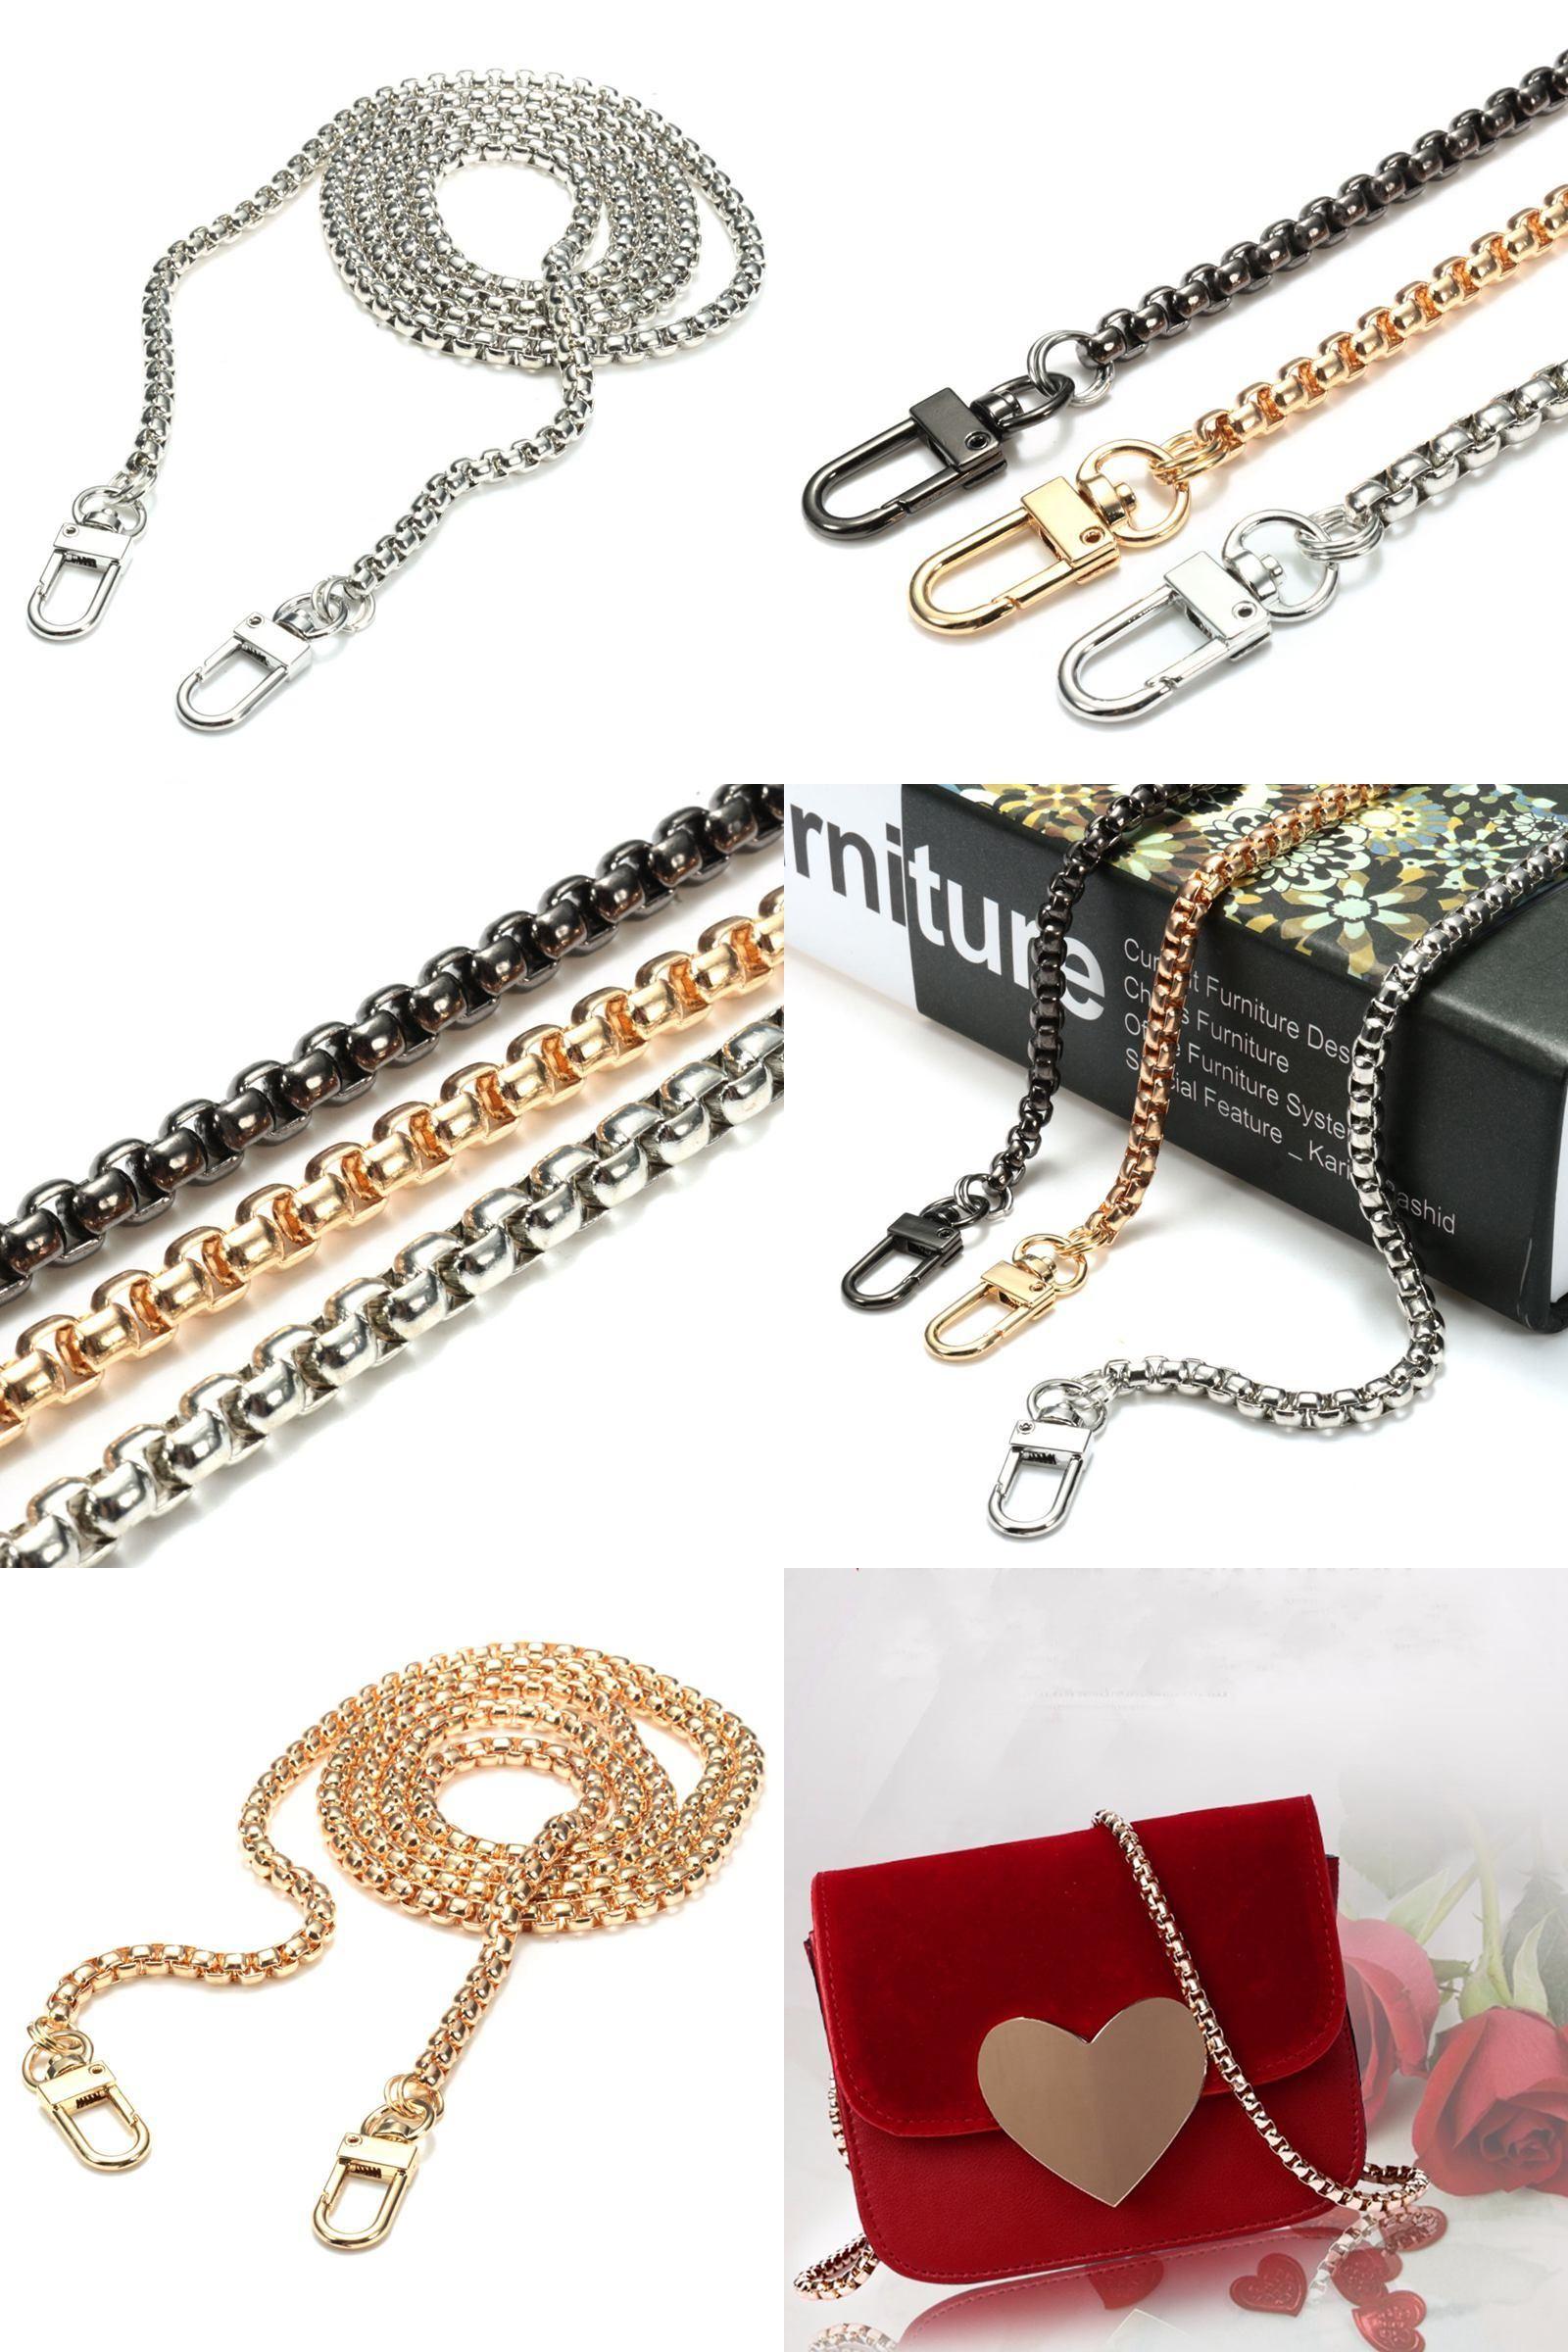 Luggage & Bags Cheap Sale Replacement Purse Chain Strap Handle Shoulder Crossbody Handbag Bag Metal 120cm